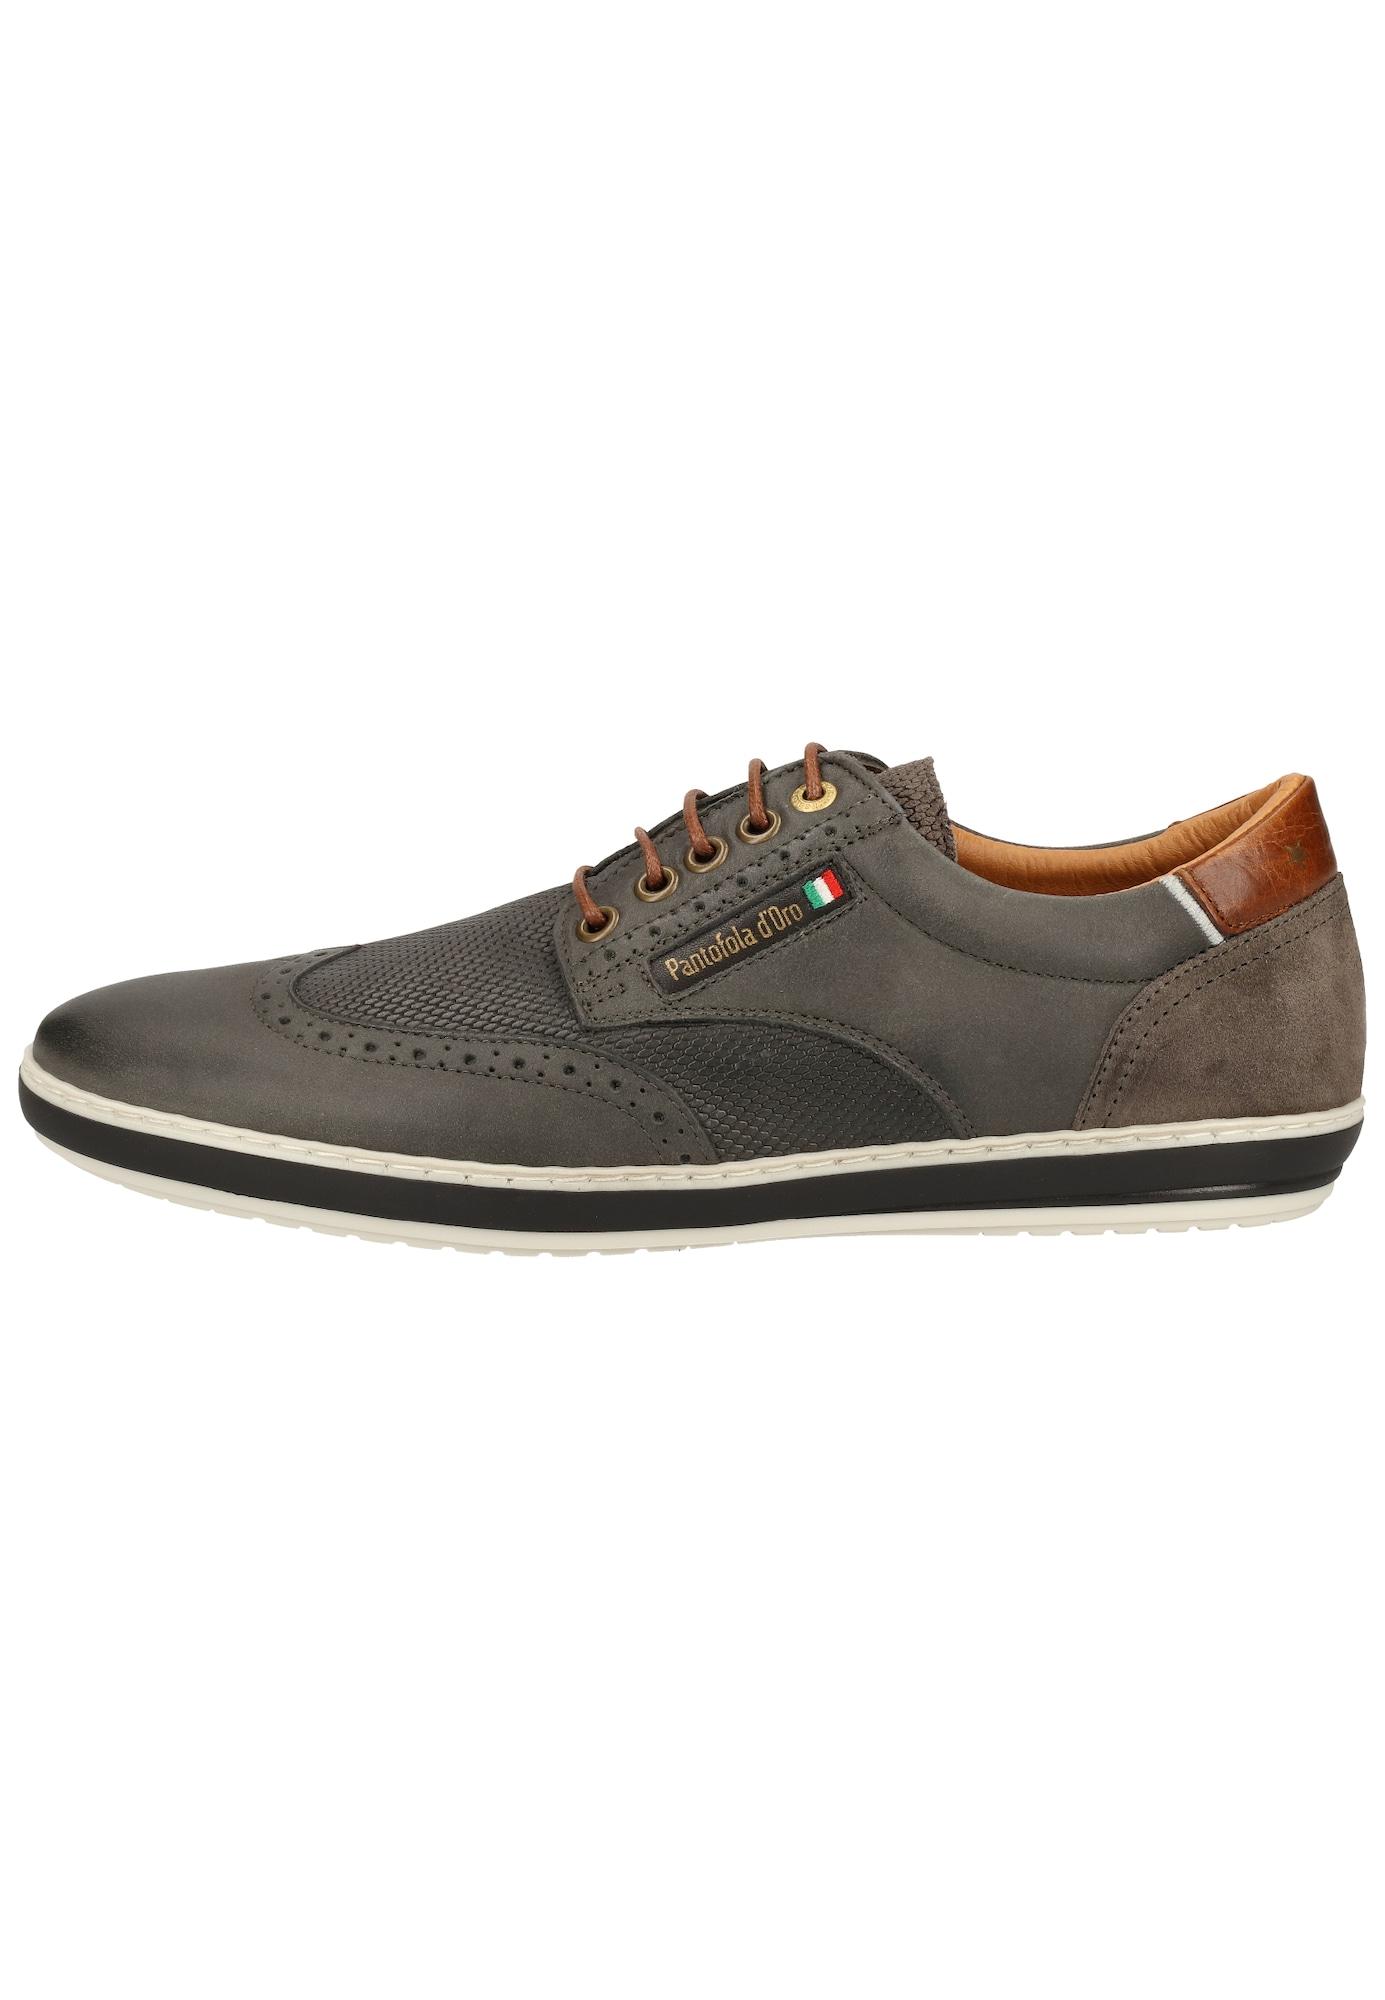 pantofola d'oro - Sneaker